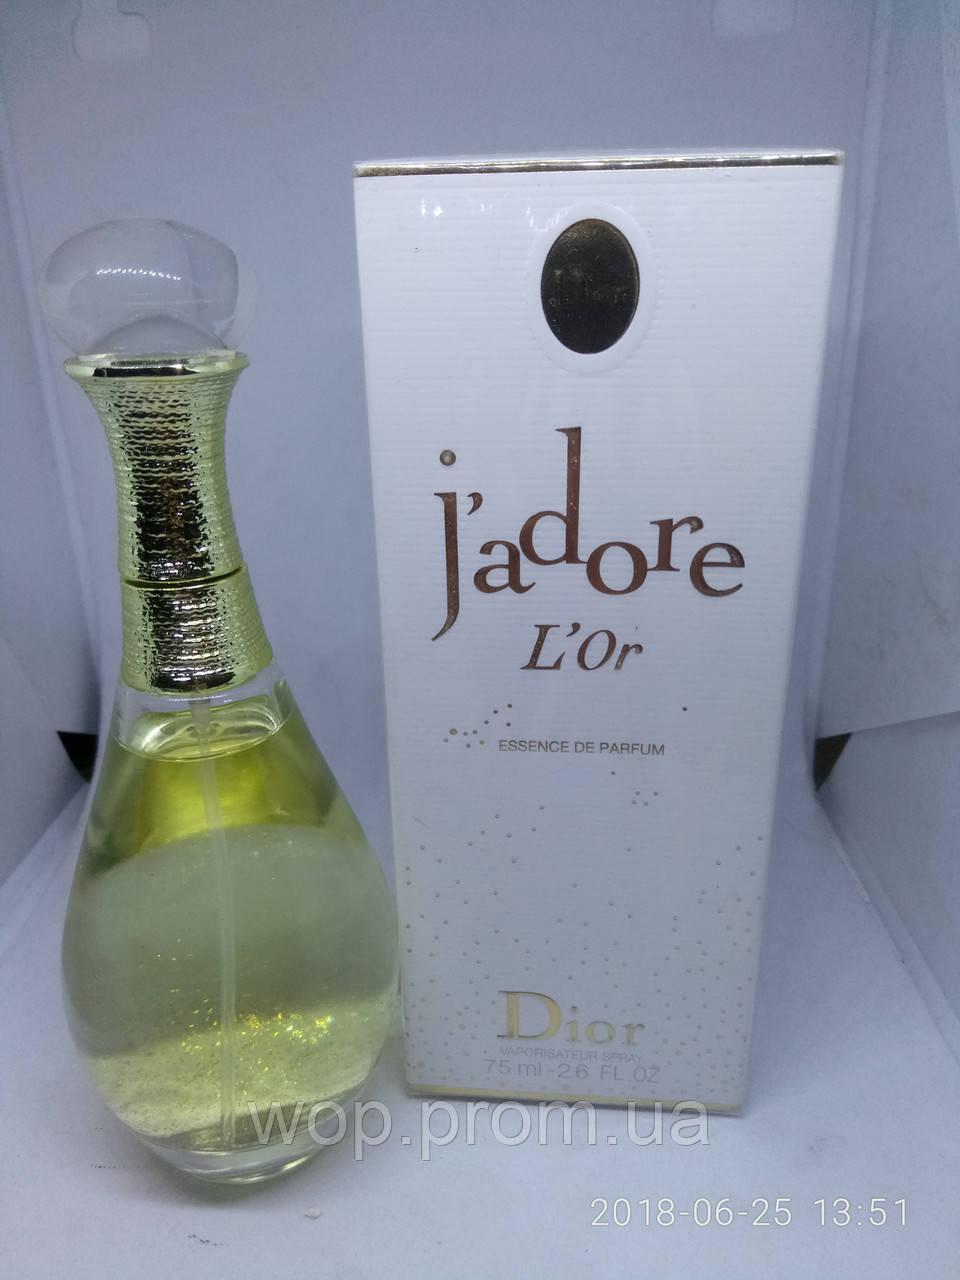 Dior Jadore Lor Essence De Parfum 75мл диор жадор лор есеннсе де